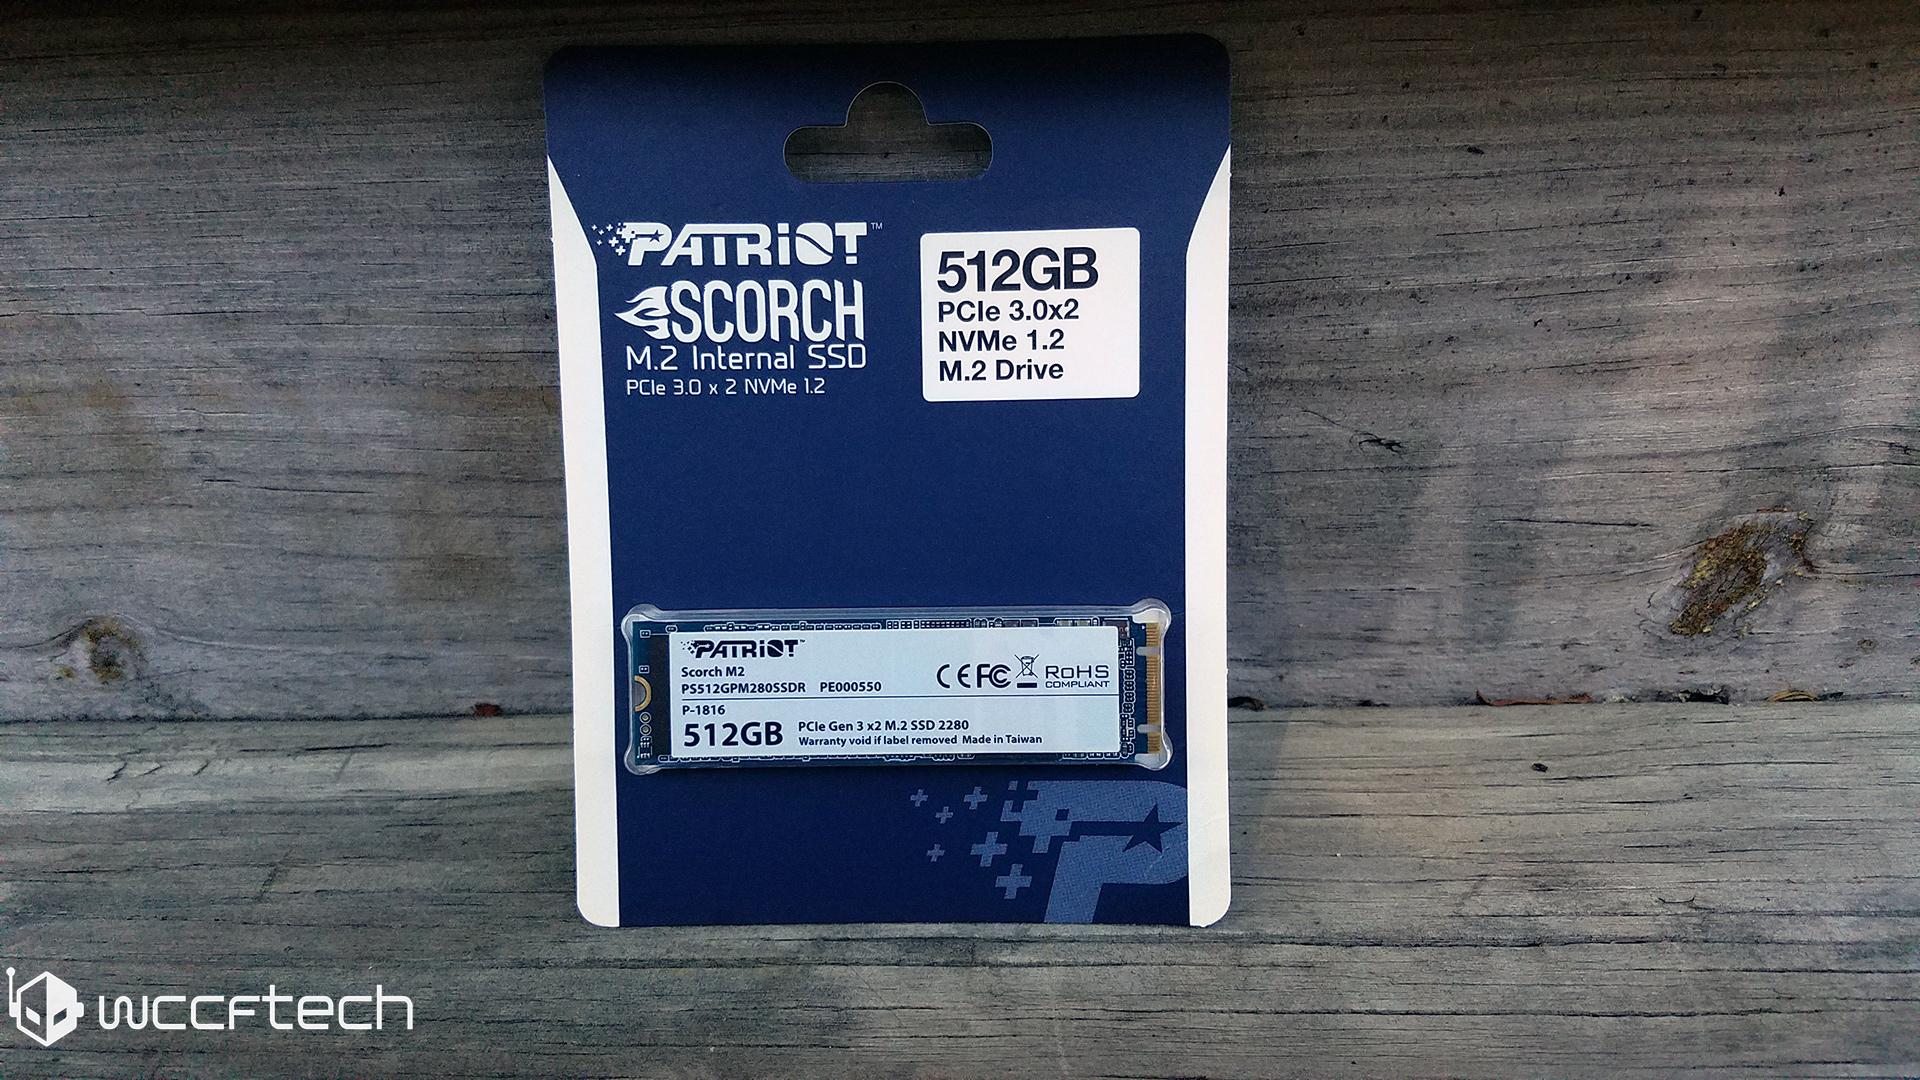 wccftech-patriot-scorch-m-2-box